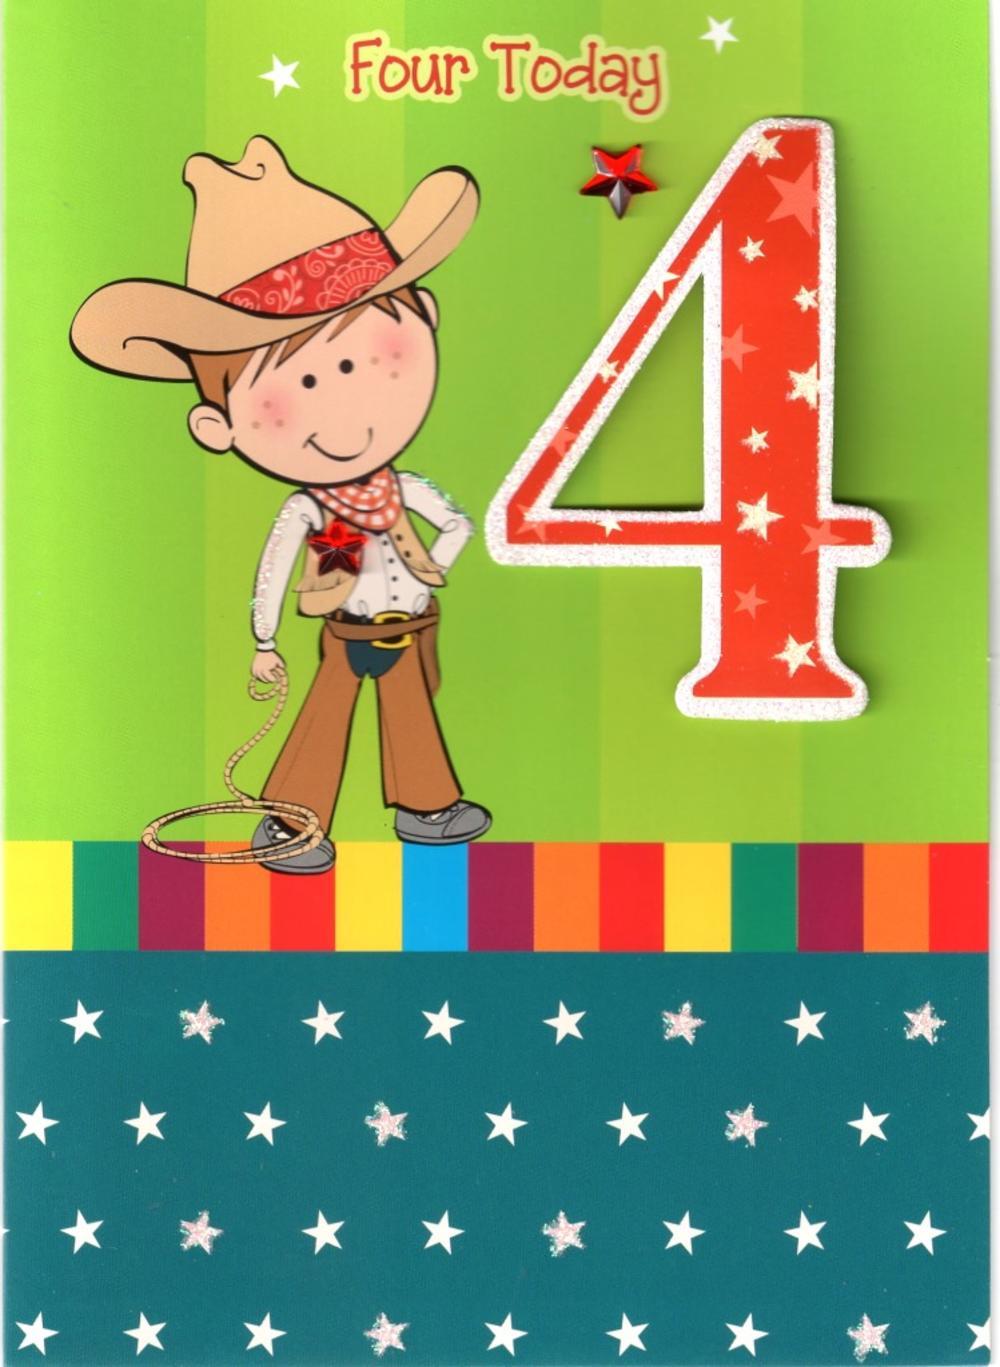 Boys 4th birthday 4 four today card cards love kates boys 4th birthday 4 four today card bookmarktalkfo Gallery